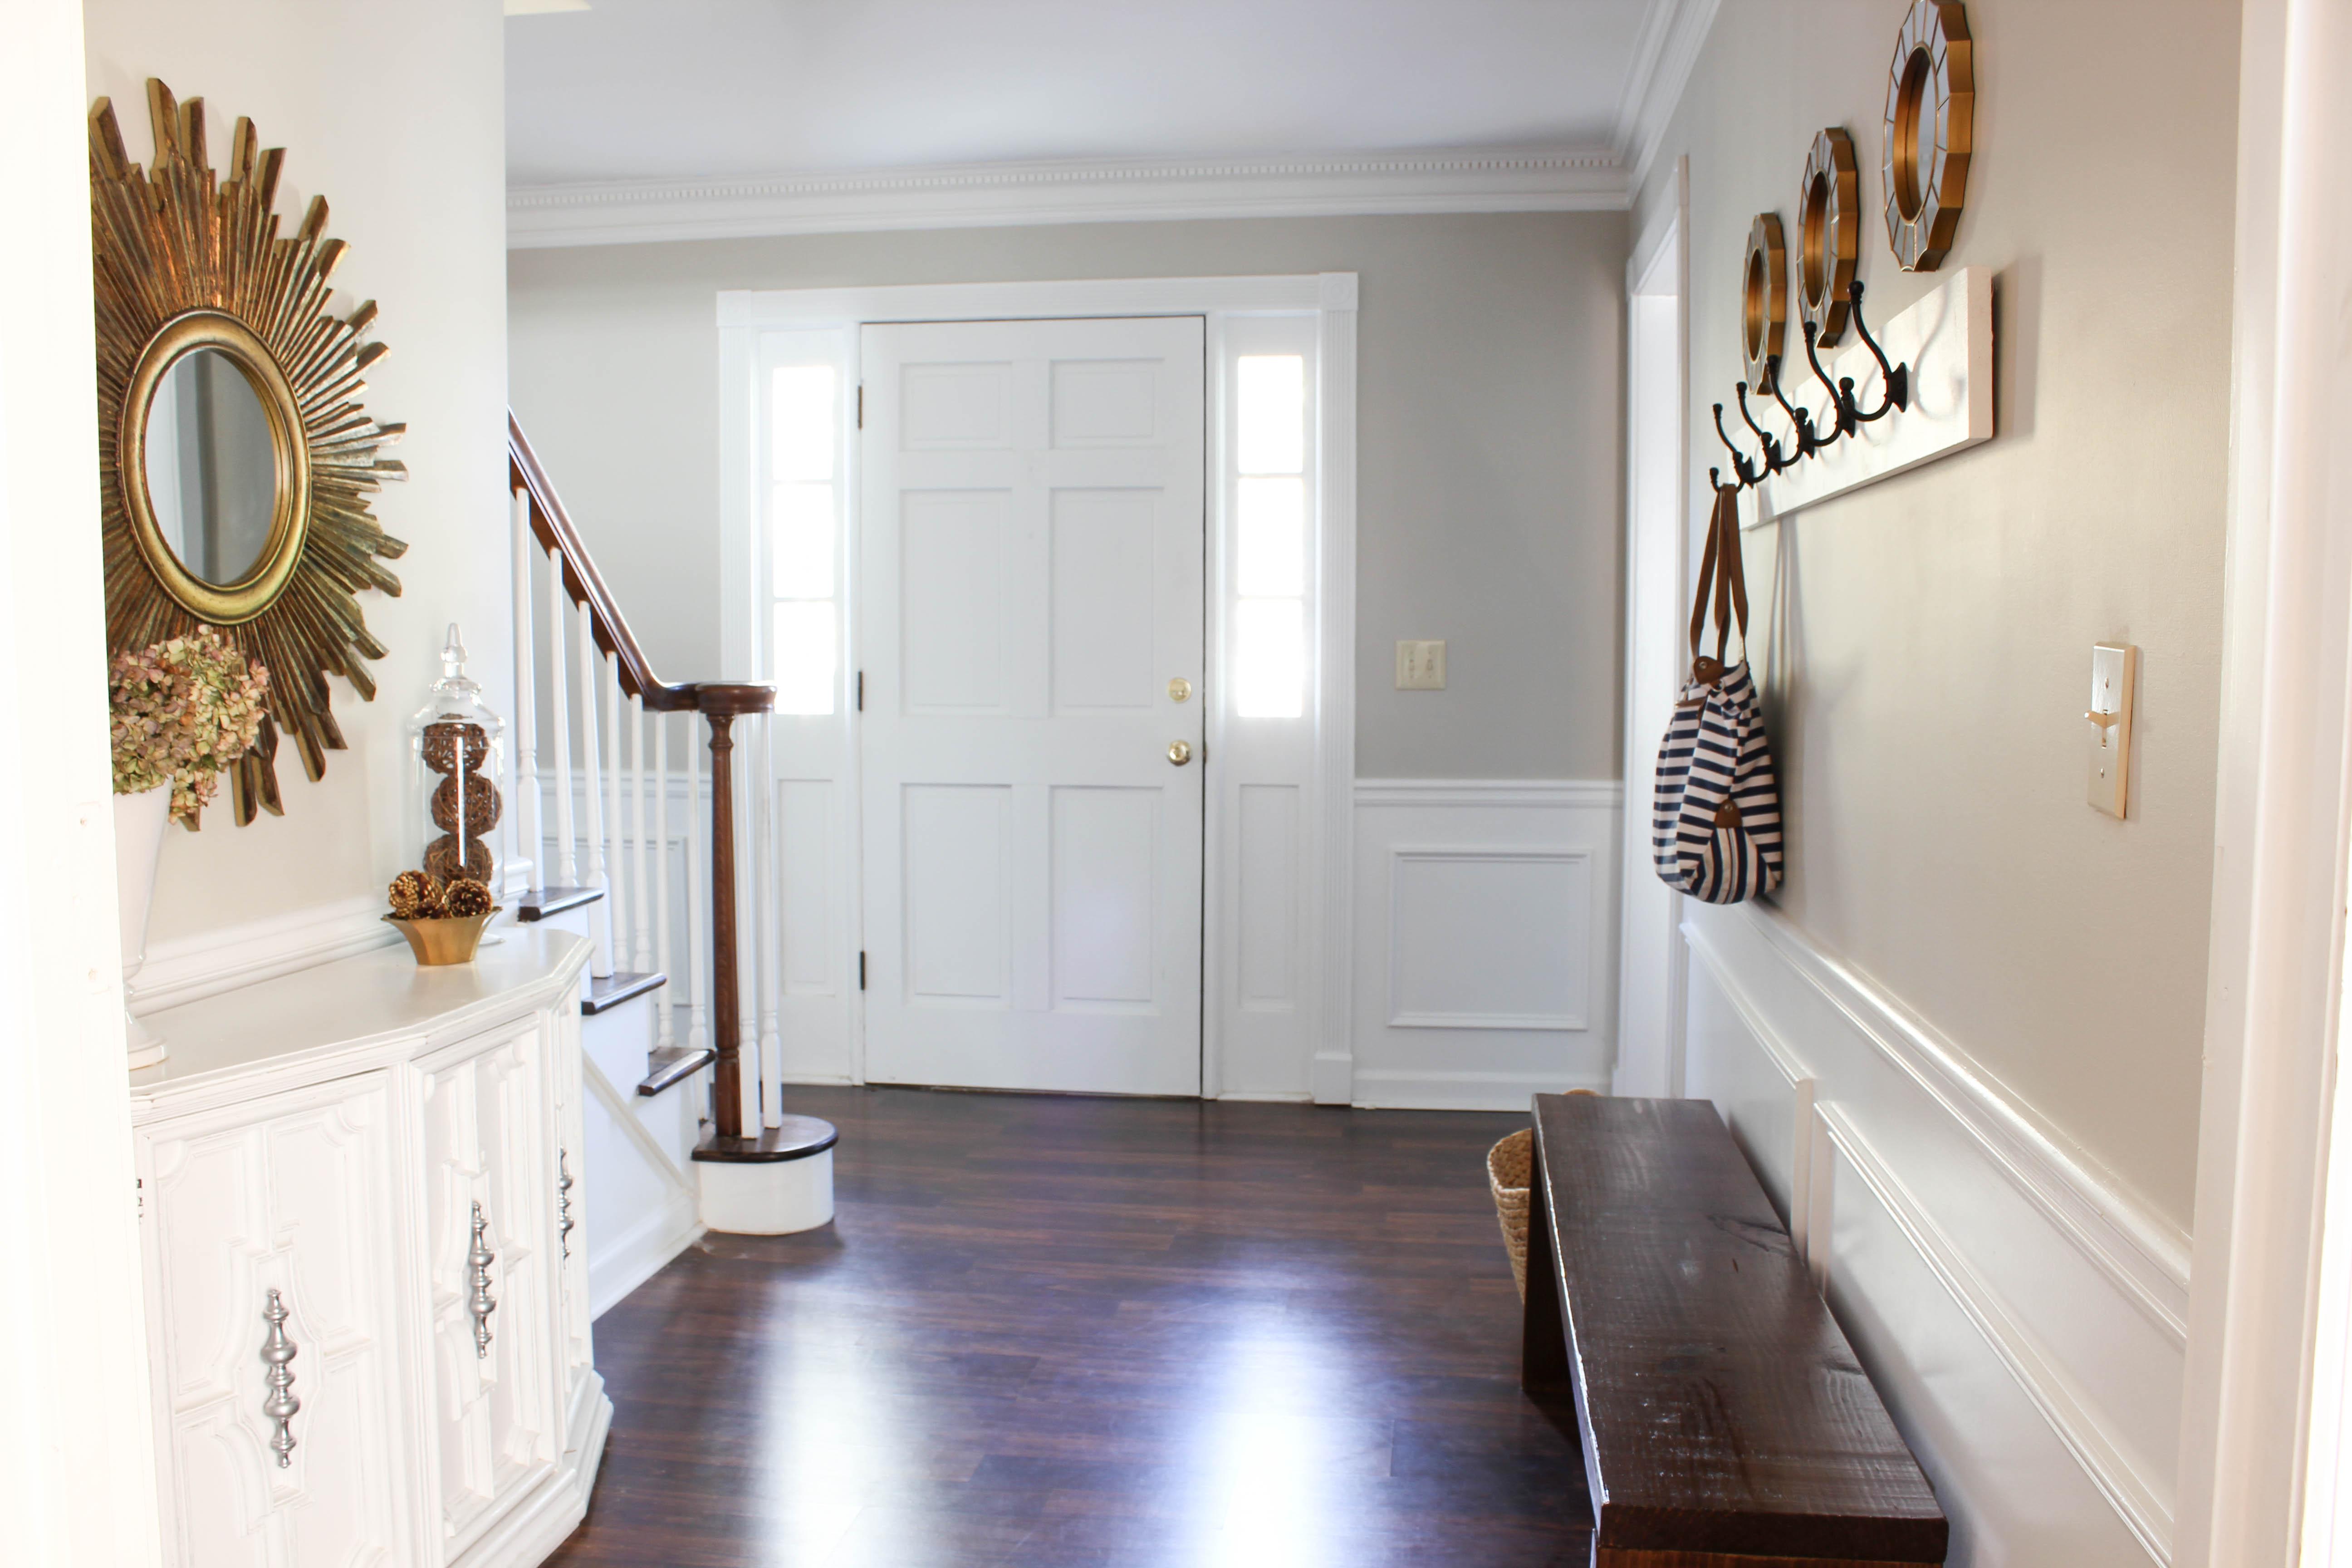 Foyer And Entryways Pub : Entryway makeover erin spain